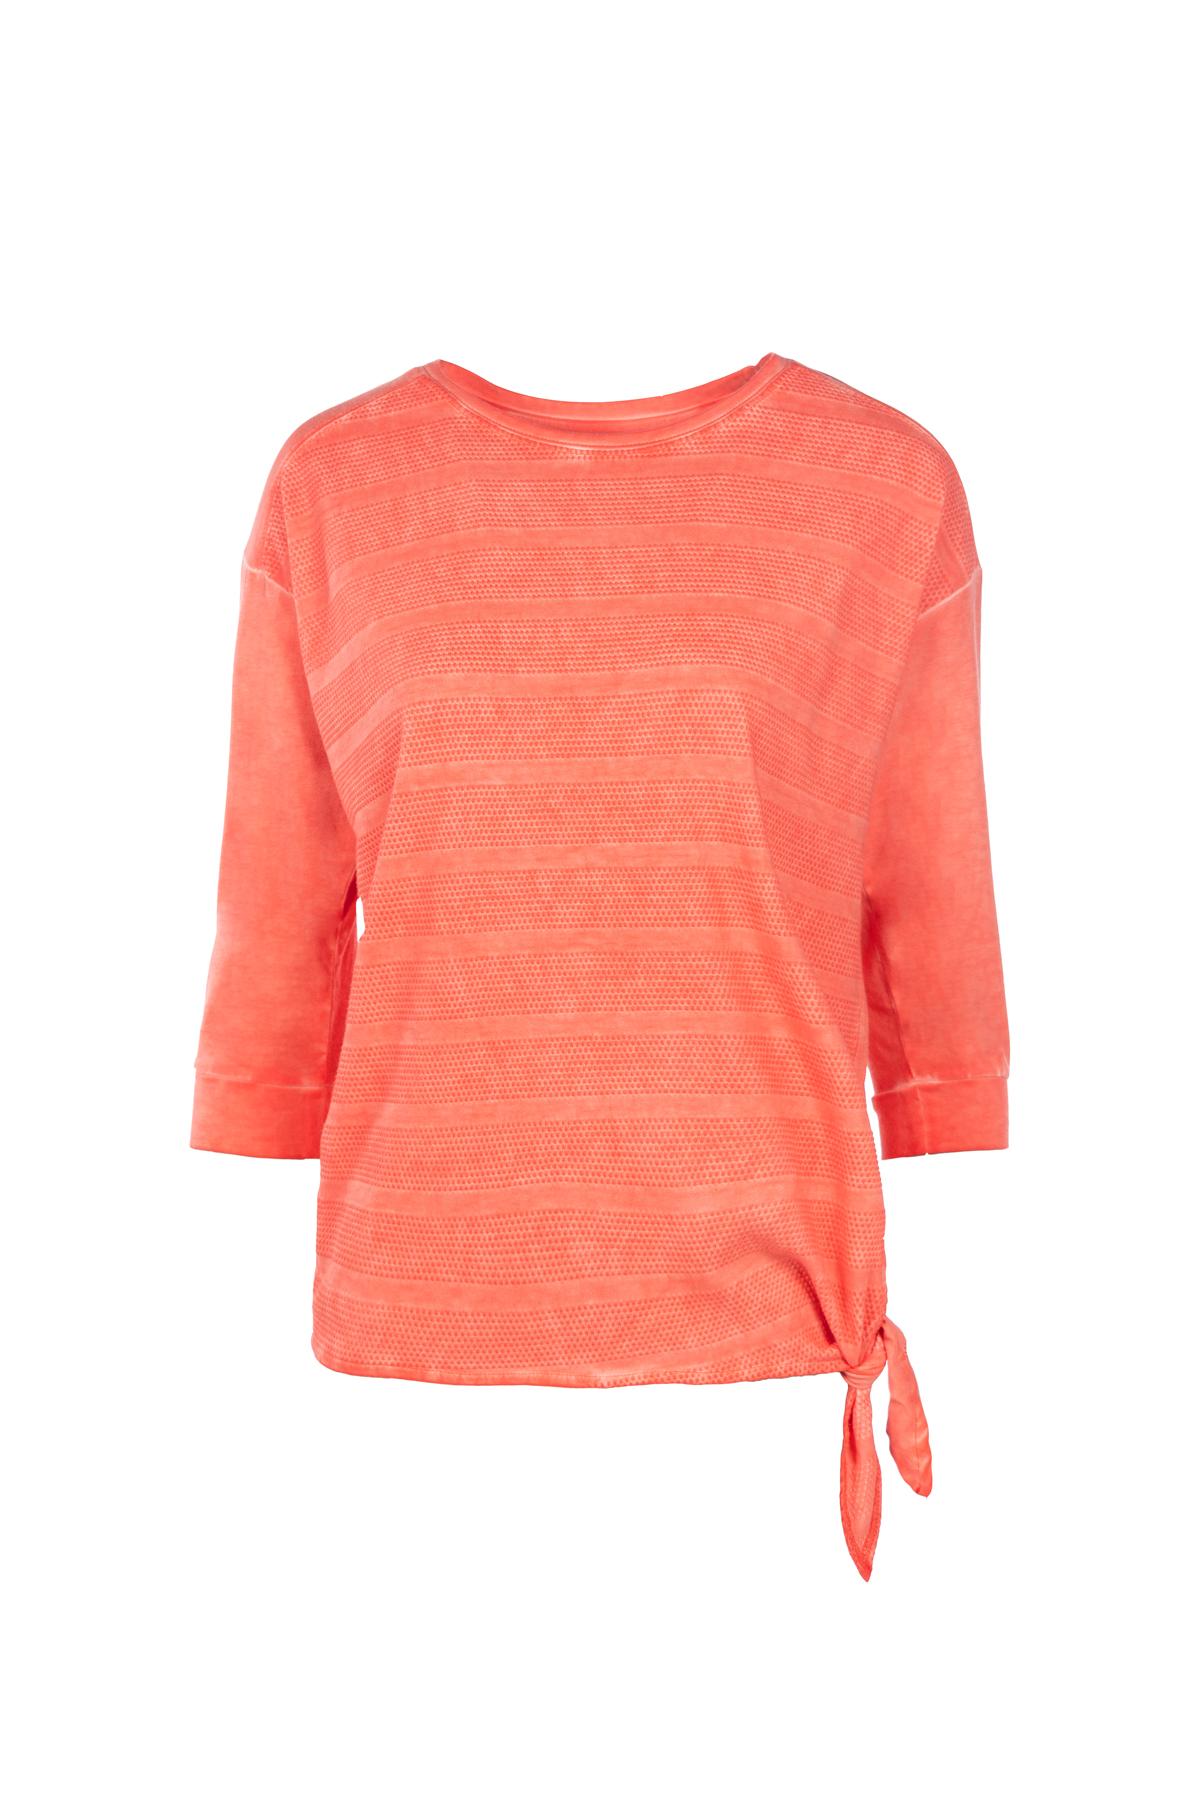 Soquesto Shirt Karin red flame